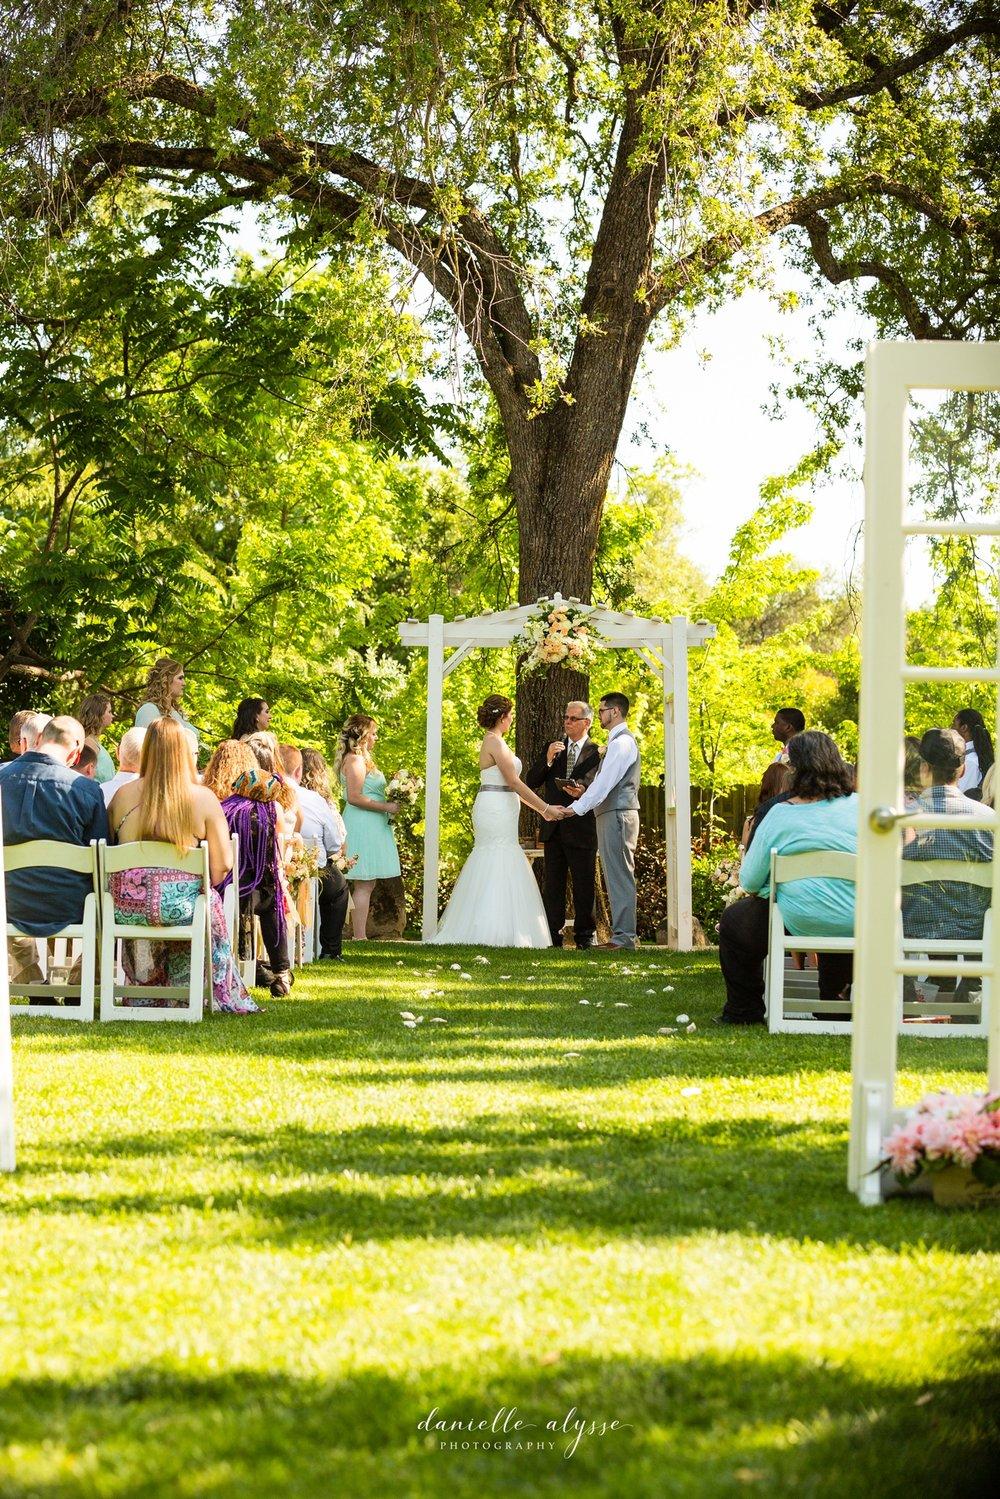 170507_blog_megan_david_wedding_loomis_flower_farm_inn_danielle_alysse_photography_sacramento_photographer0172_WEB.jpg